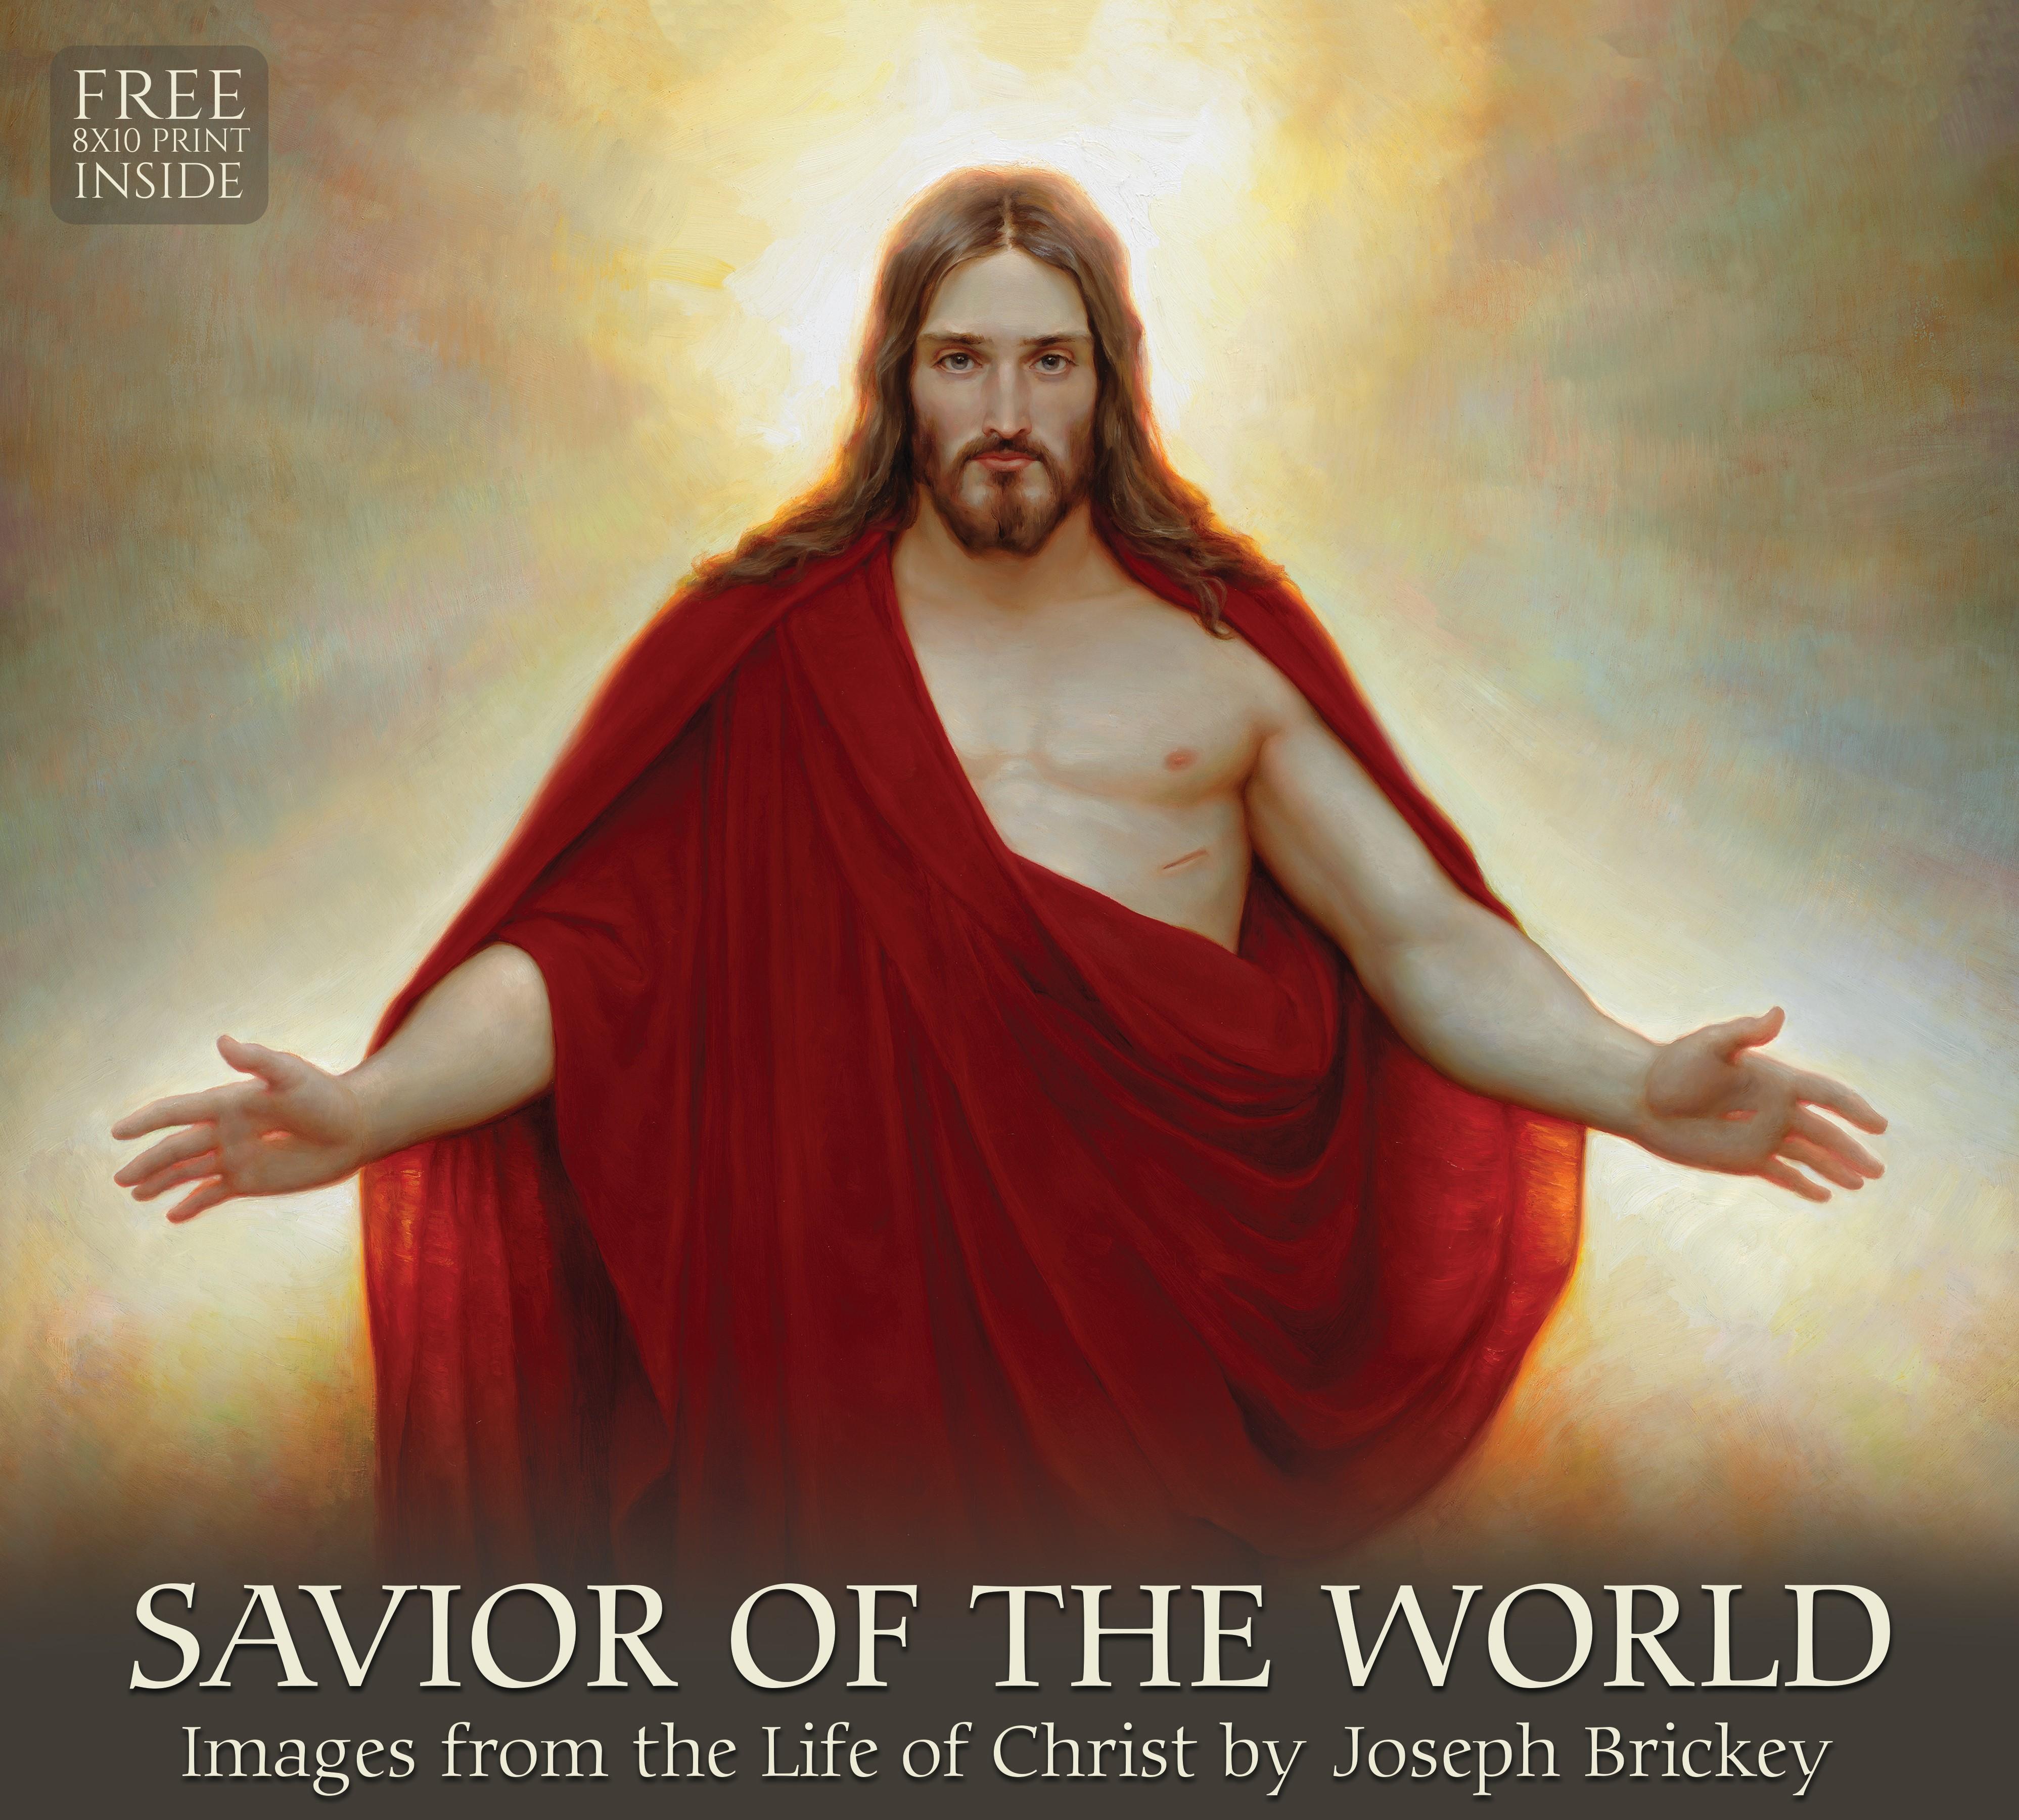 2019 Calendar - Savior of The World